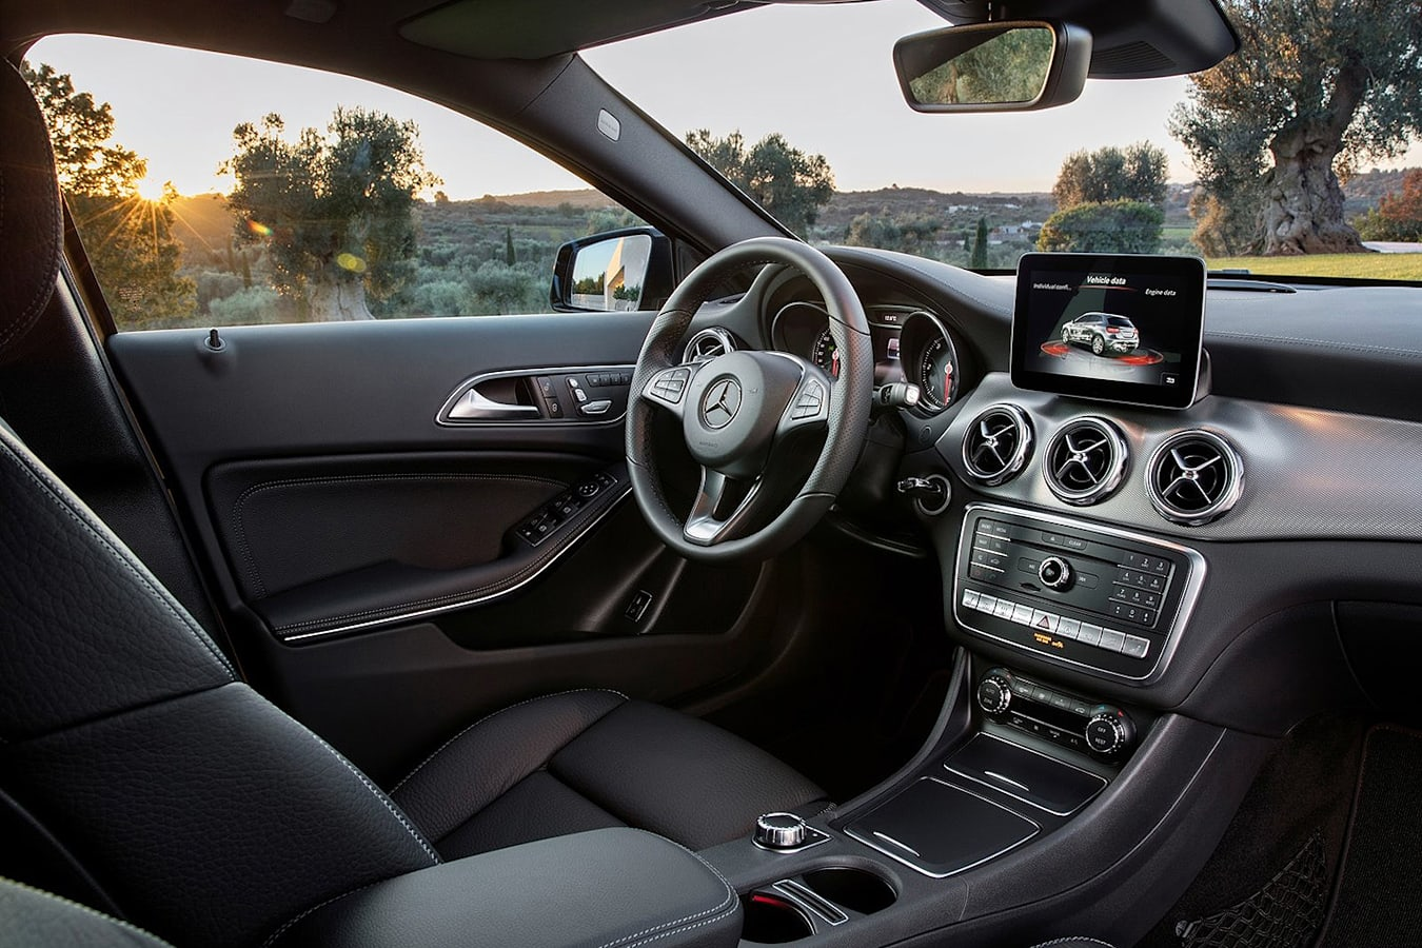 Mercedes Benz Gla 2018 Standard Interior Finish Jpg